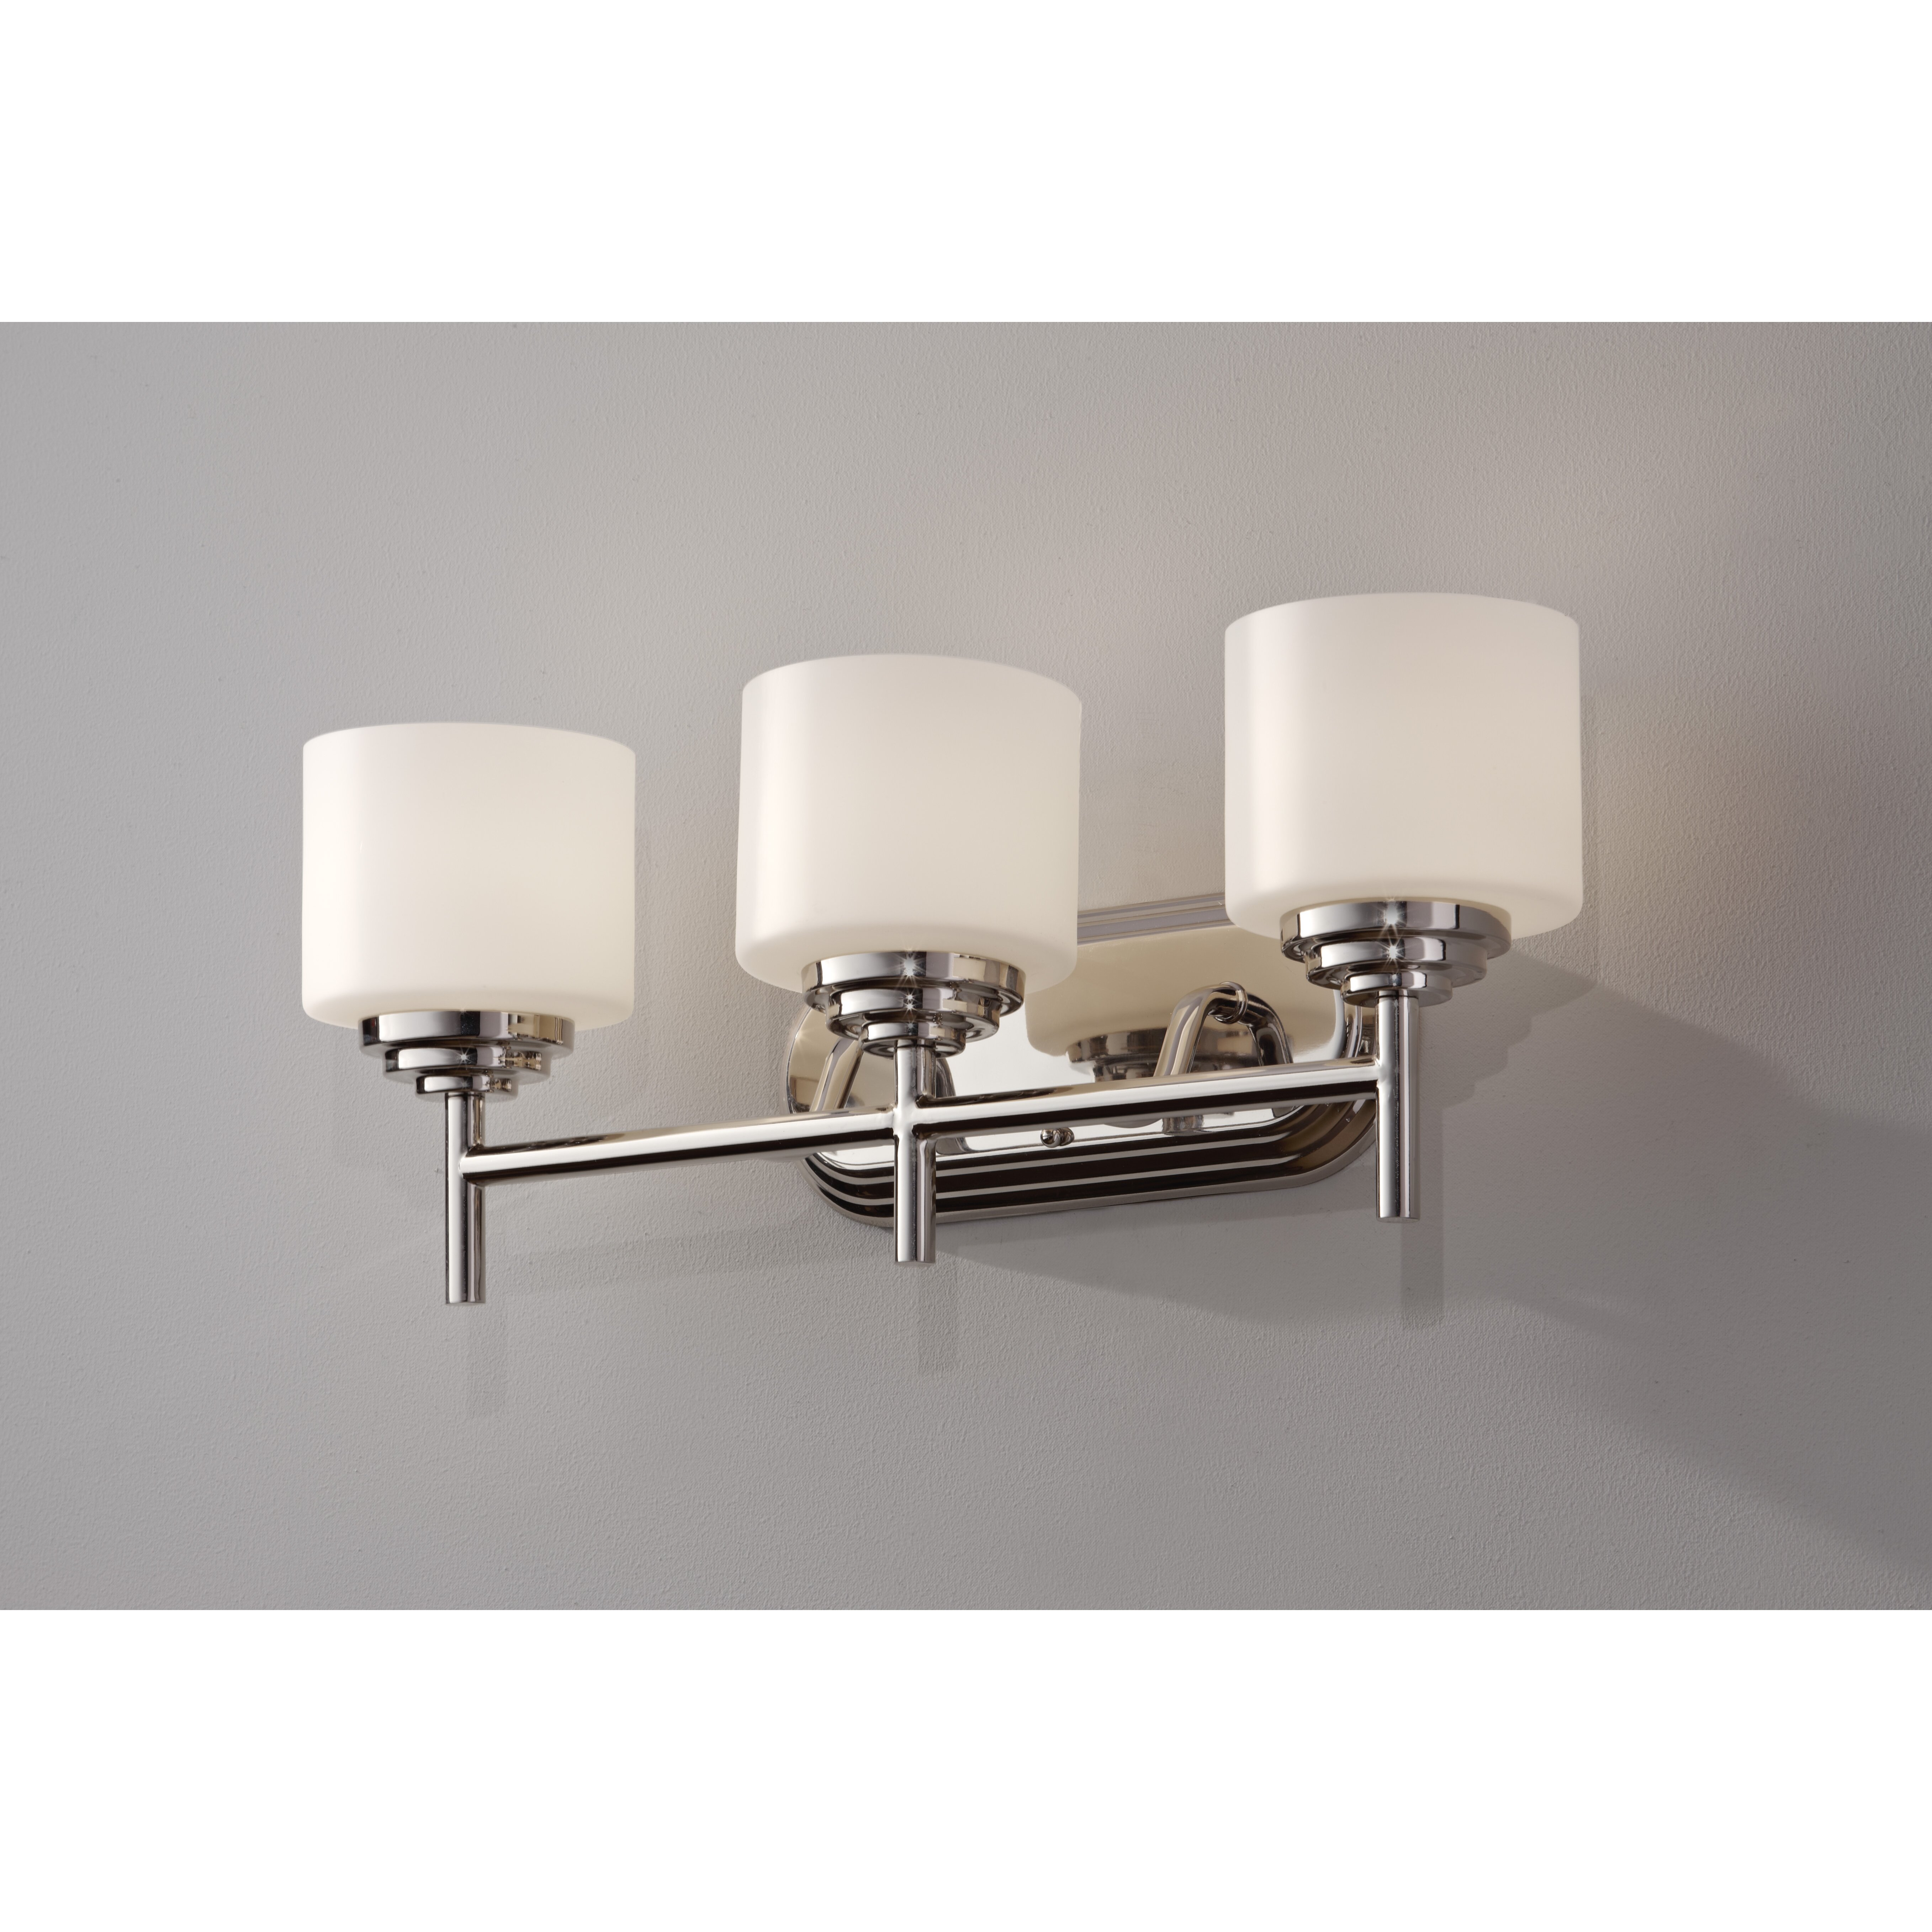 Bathroom Vanity Lights Wayfair : Feiss Malibu 3 Light Bath Vanity Light & Reviews Wayfair